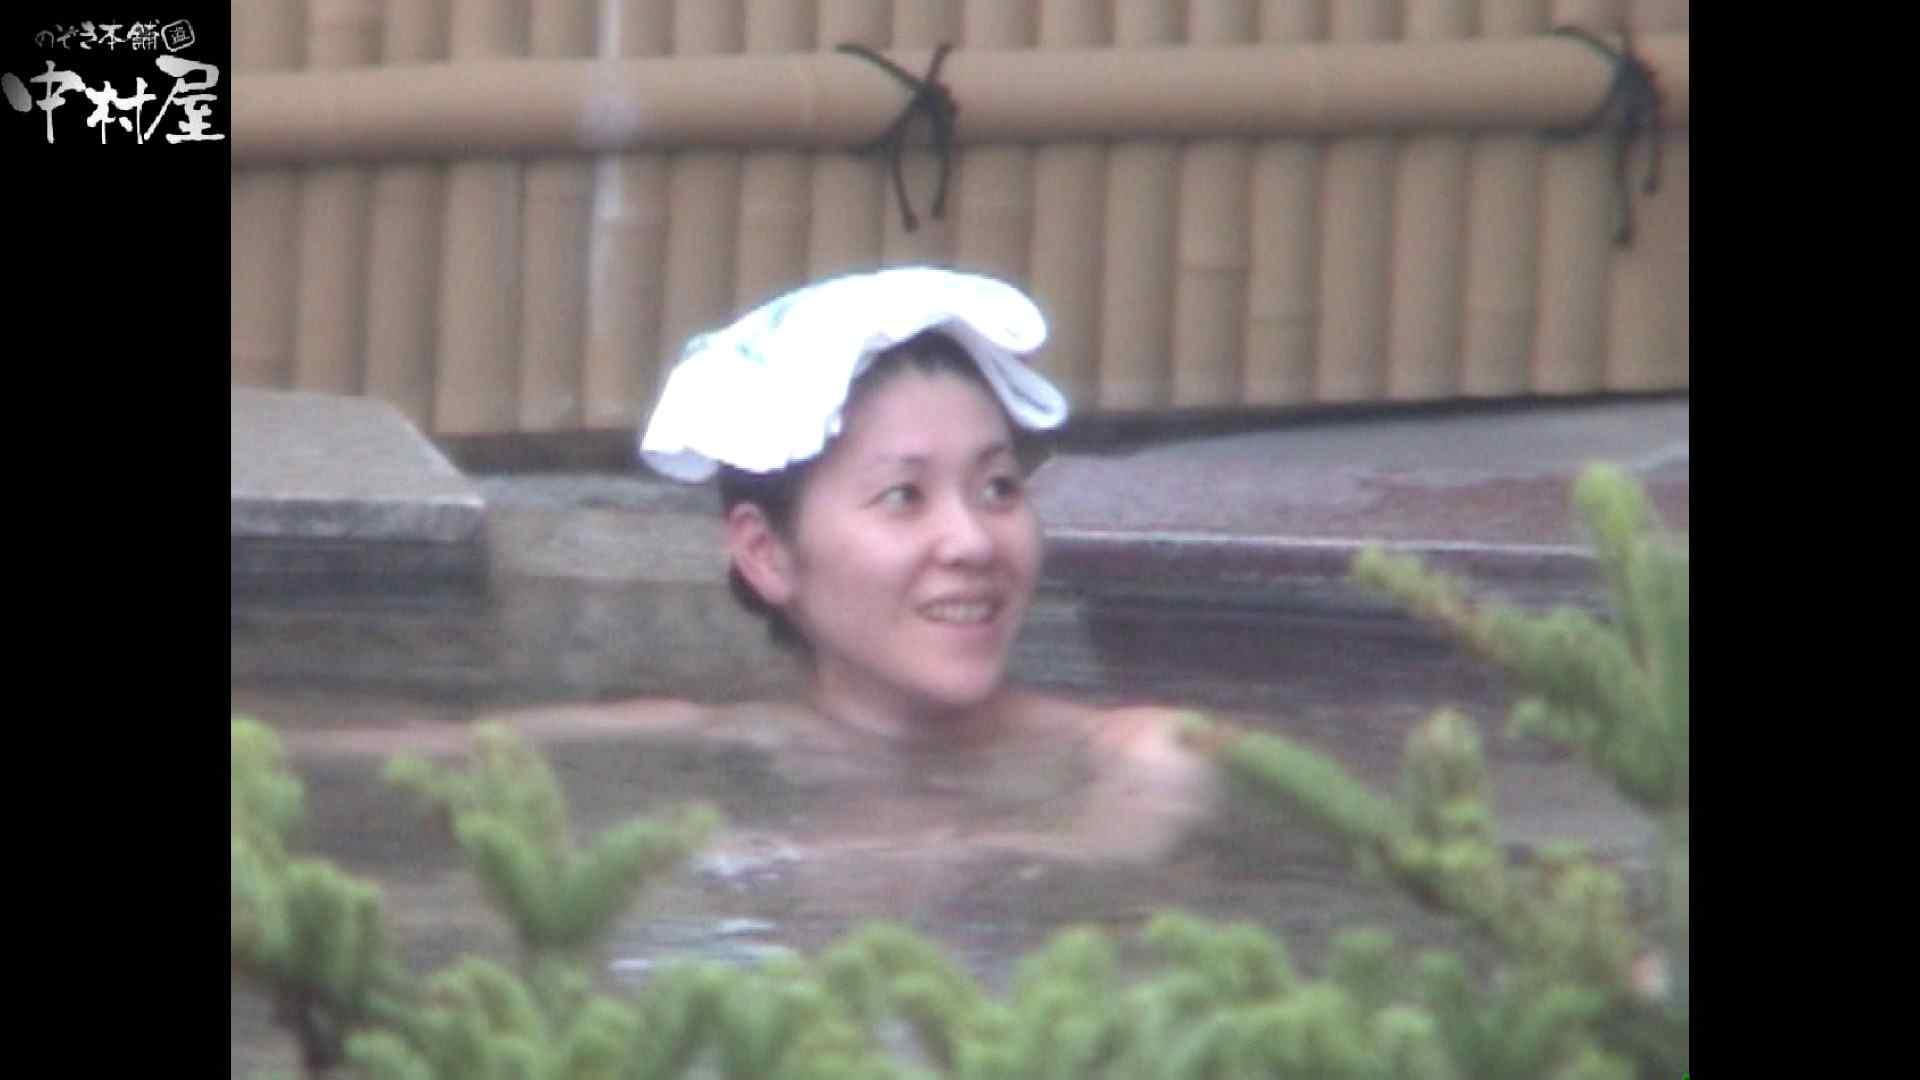 Aquaな露天風呂Vol.925 盗撮   HなOL  104pic 101